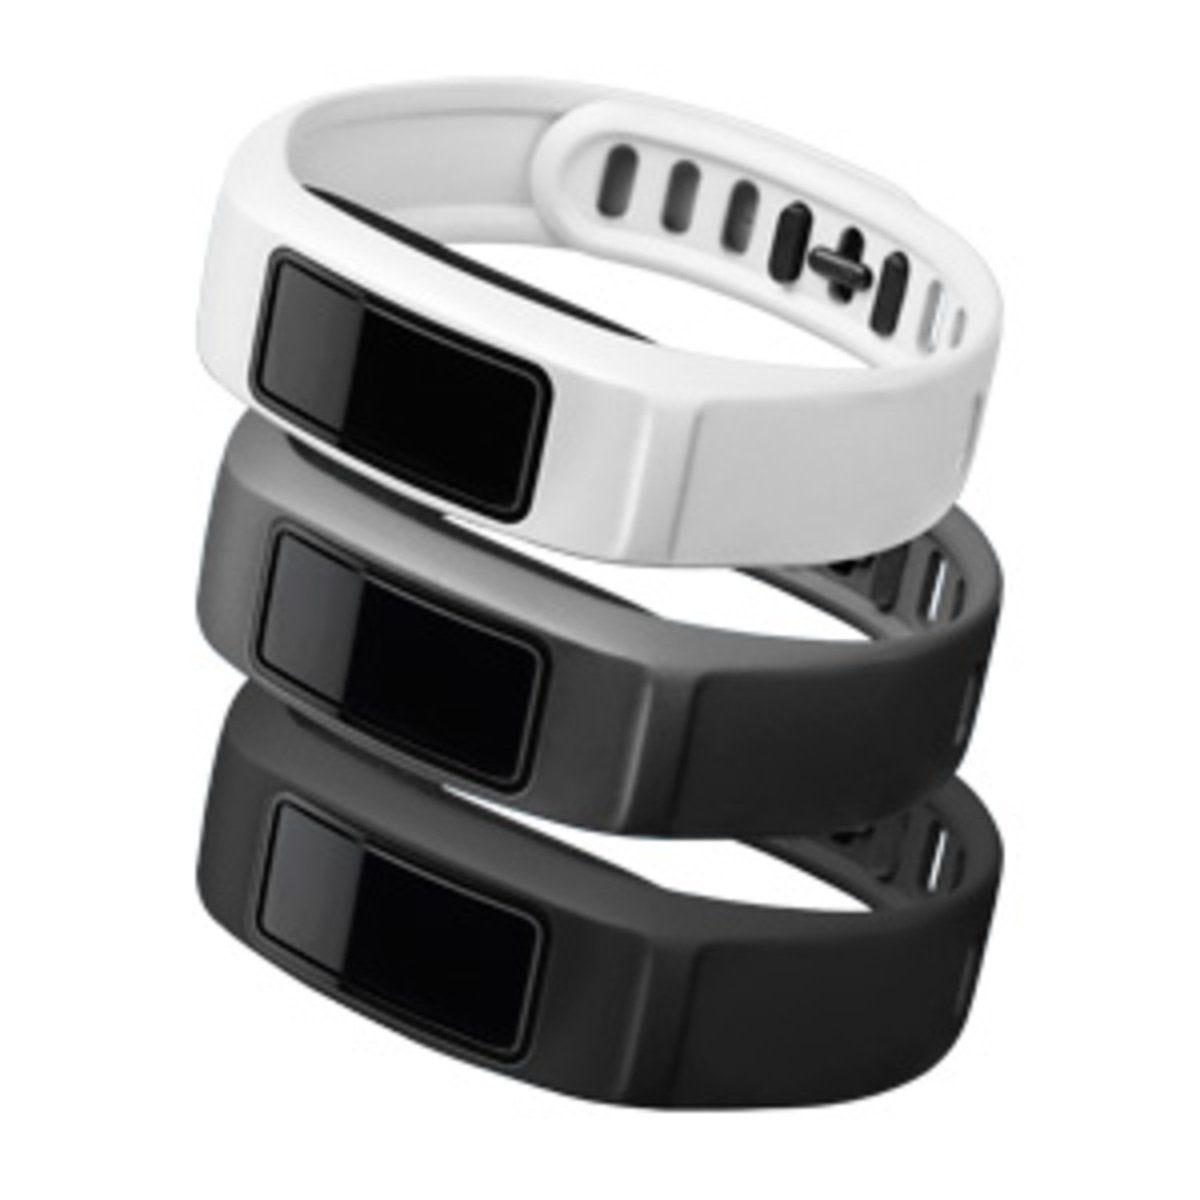 Garmin Ersatzarmbänder »Armbänder vivofit 2 - Weiß, Grau, Schwarz (S)«